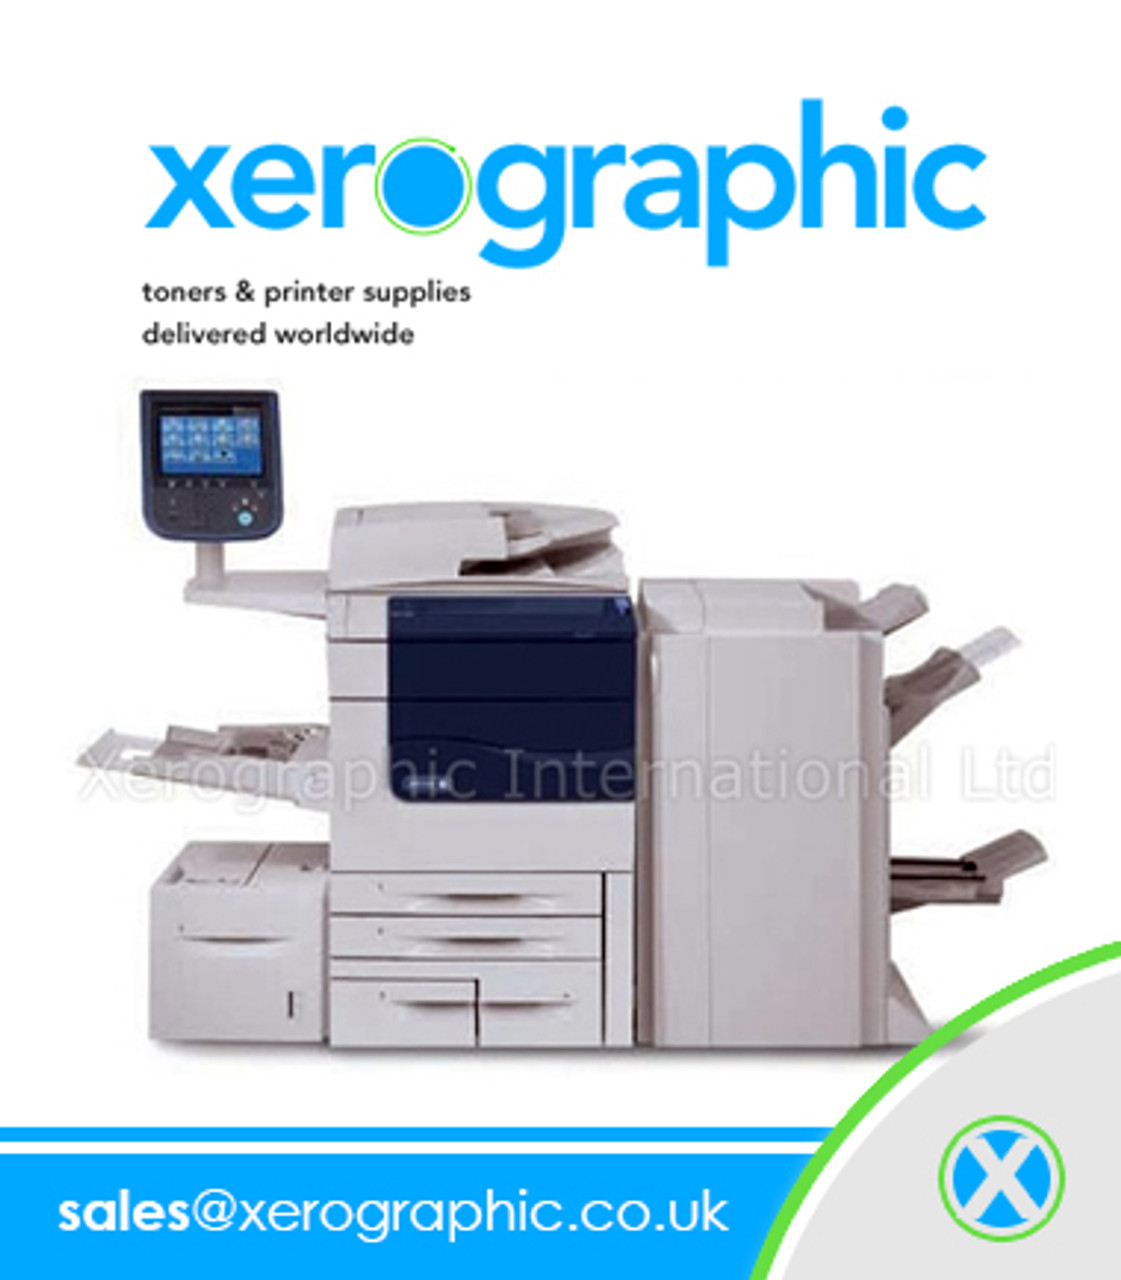 033K94681 033K94682 033K94680 655N50040 Genuine Ibt Cleaner Blade Xerox  DocuColor Digital Press 700 700i 700F Xerox Color 550F 560 C75 J75